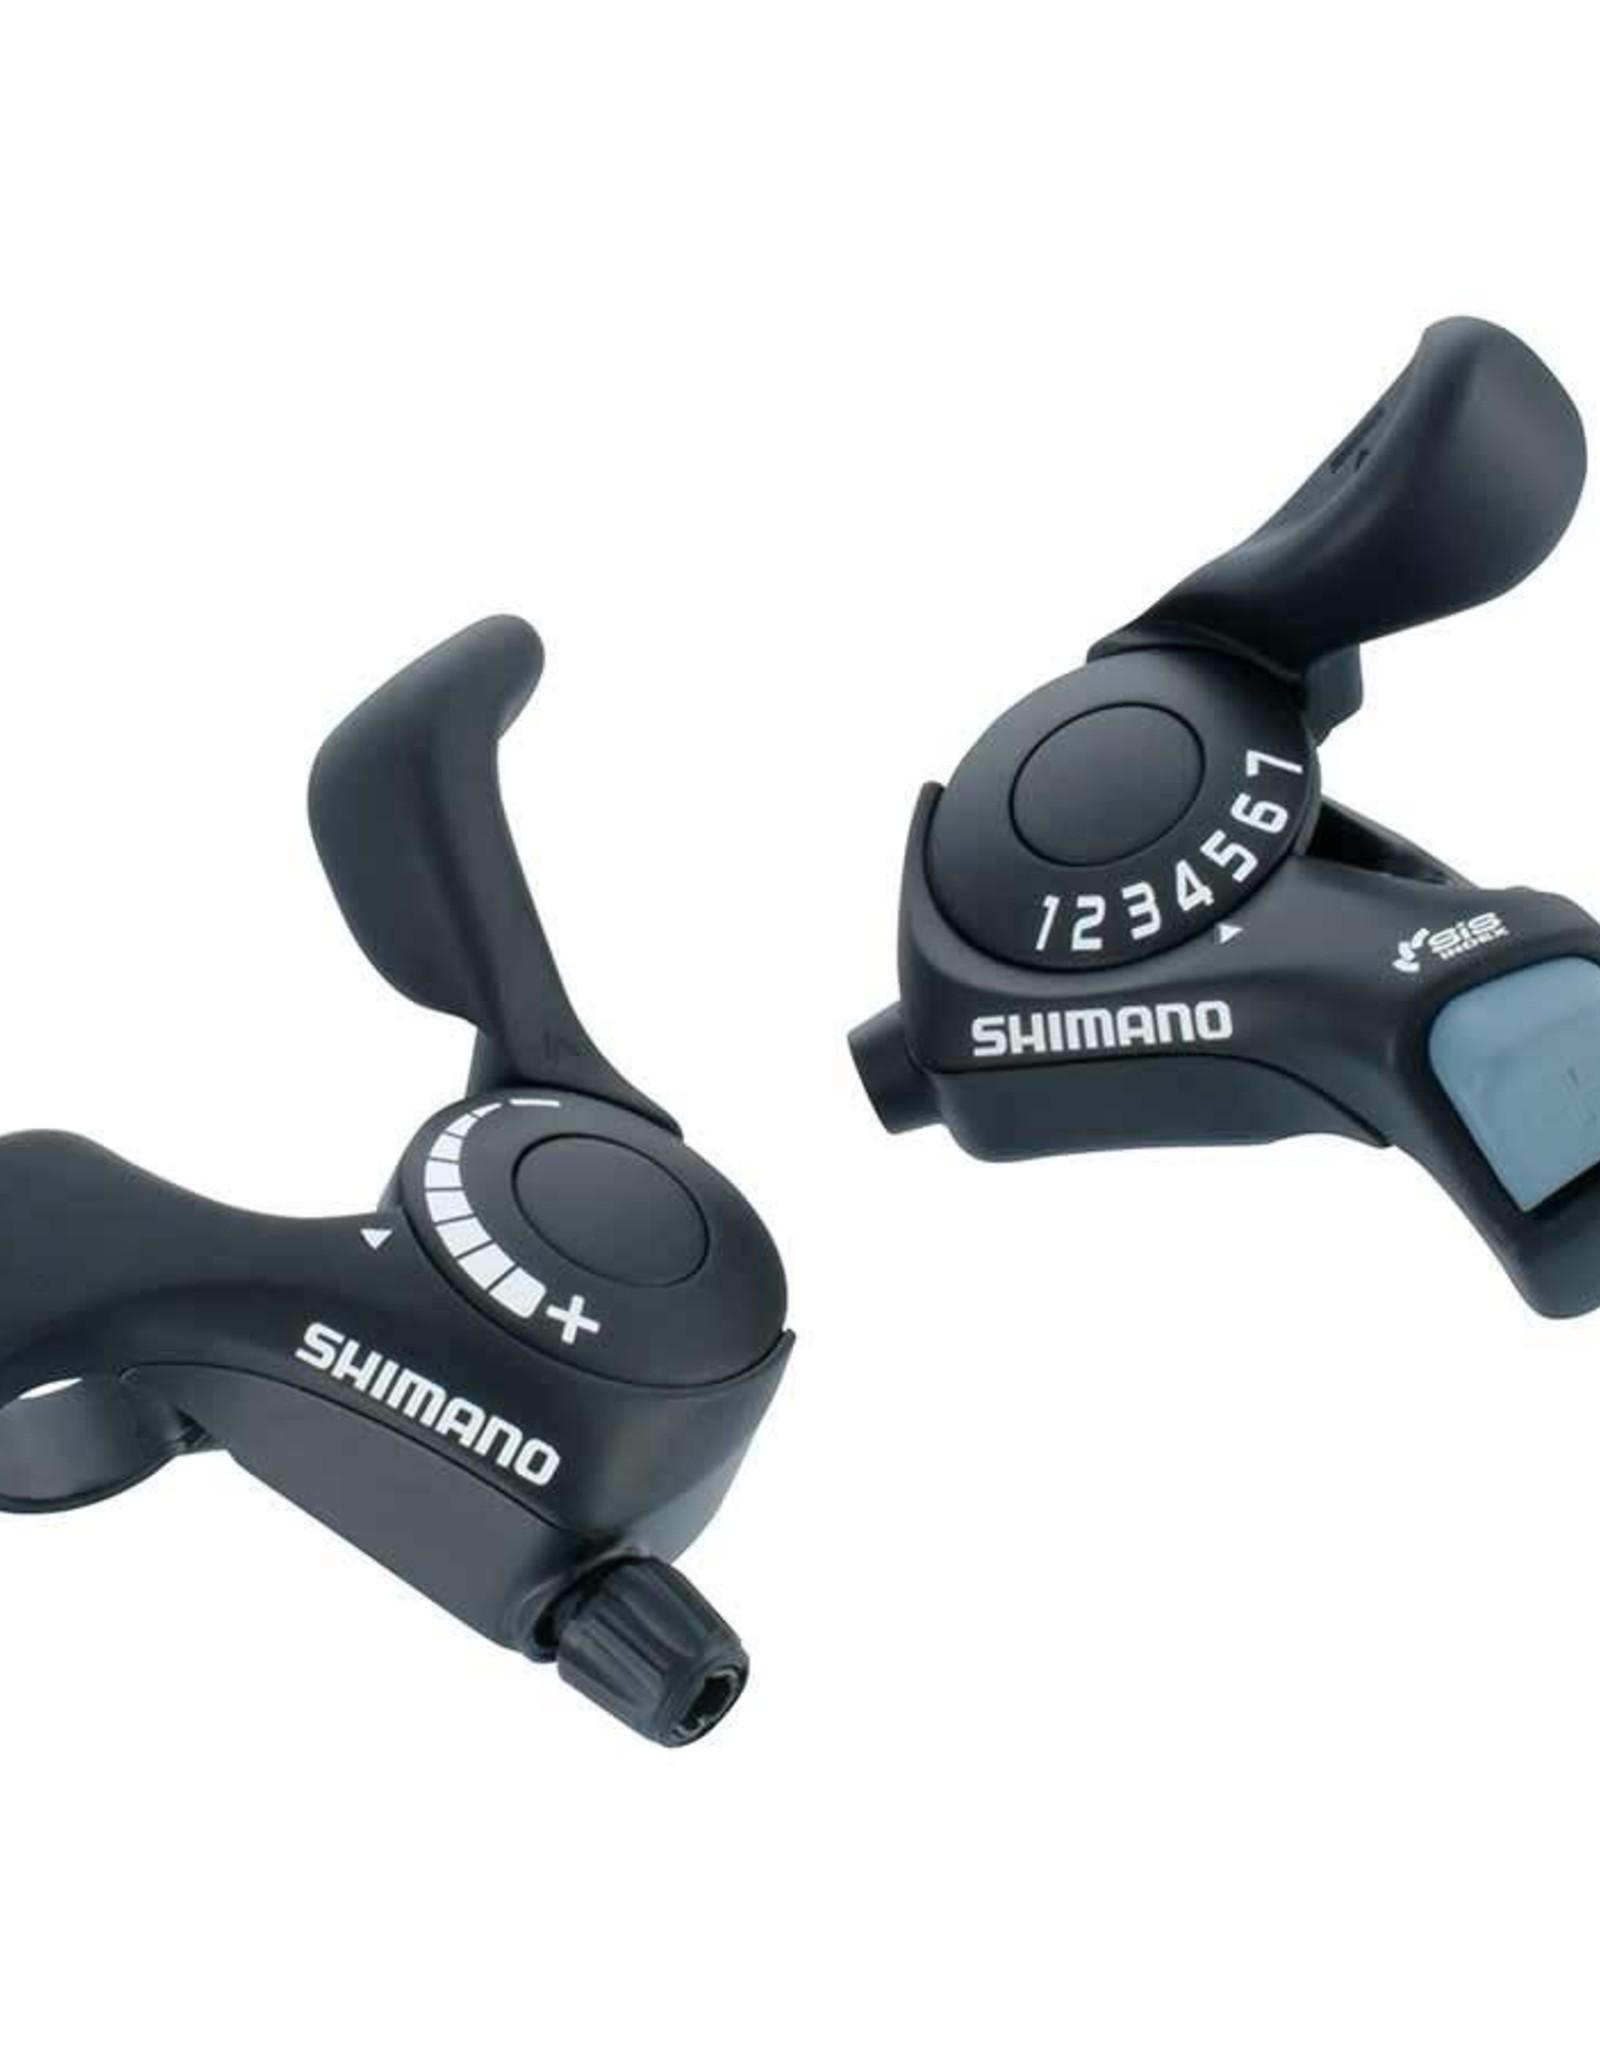 Shimano Shimano, Tourney SL-TX30, Shift levers, 6 sp., Pair